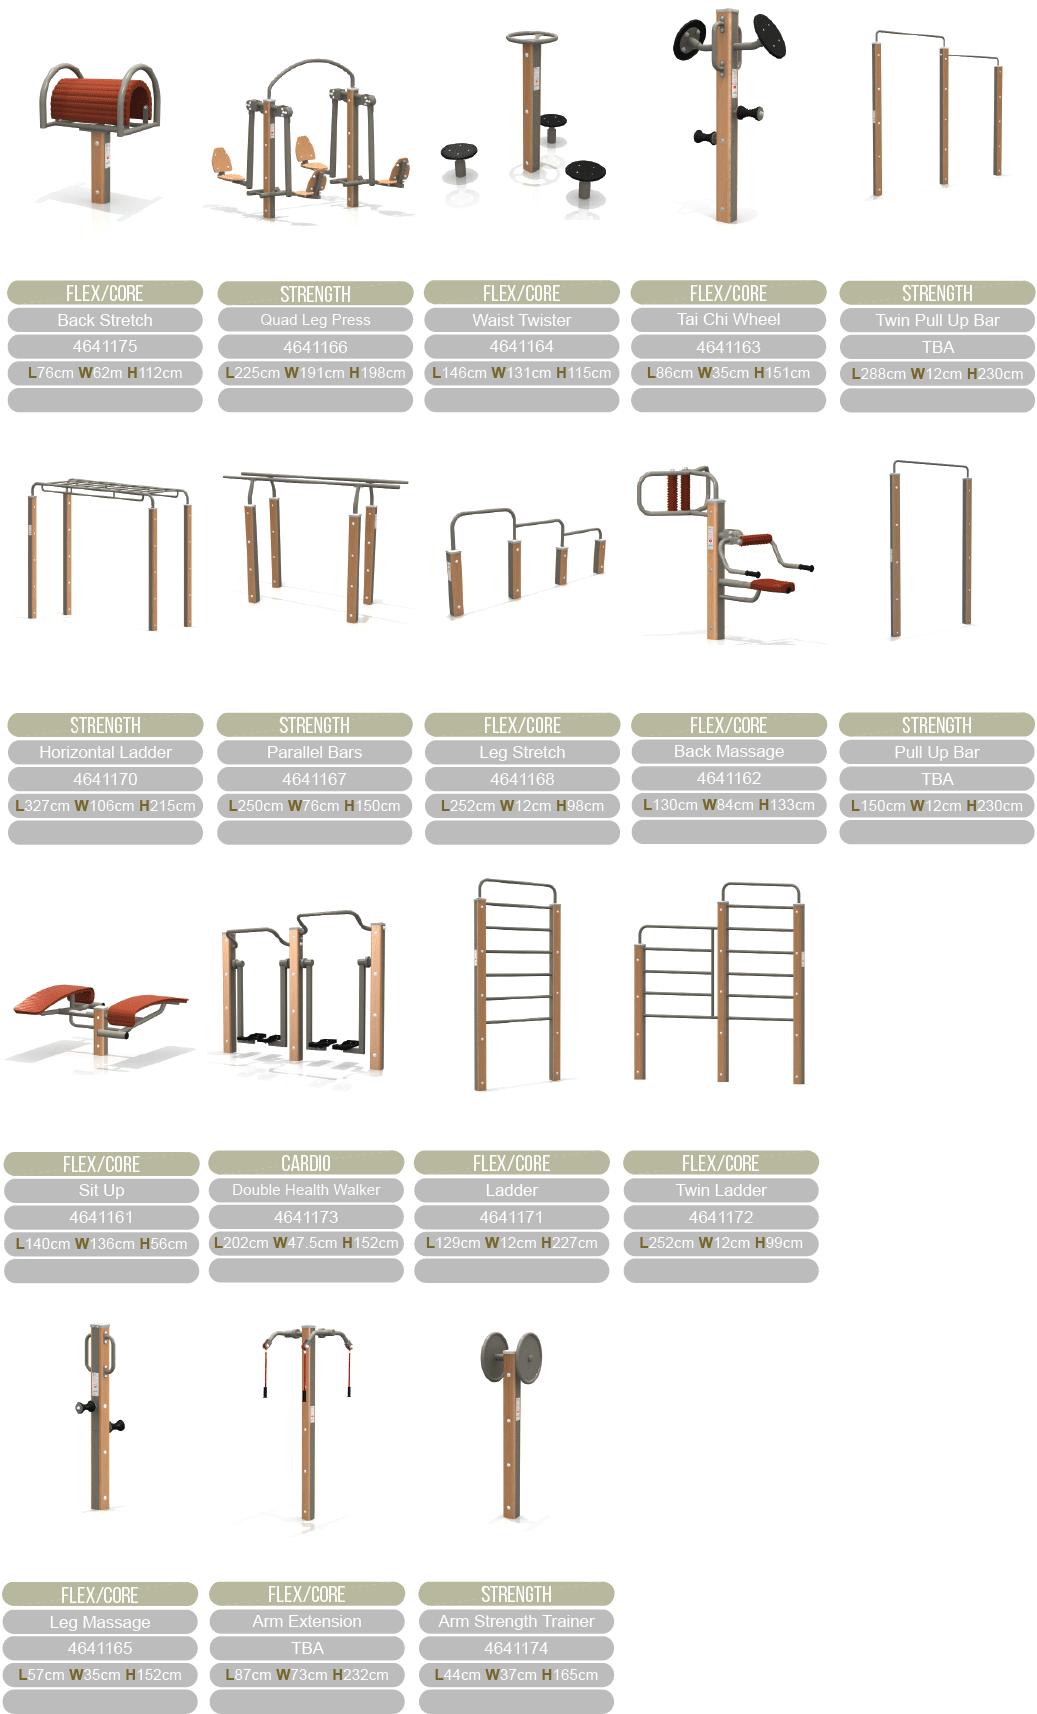 Natural fitness equipment range